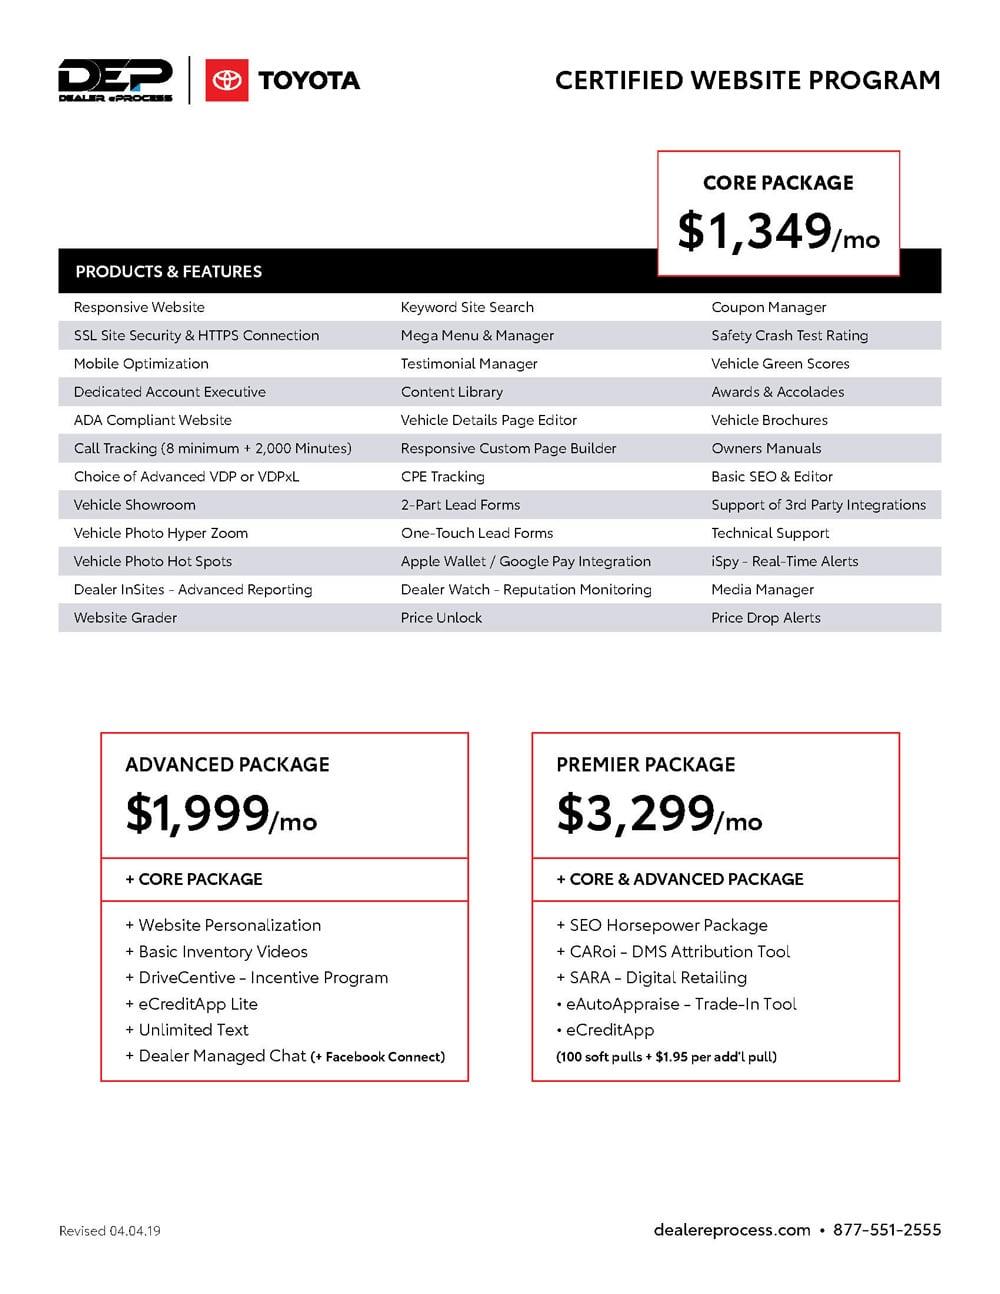 Toyota Website Program price sheet